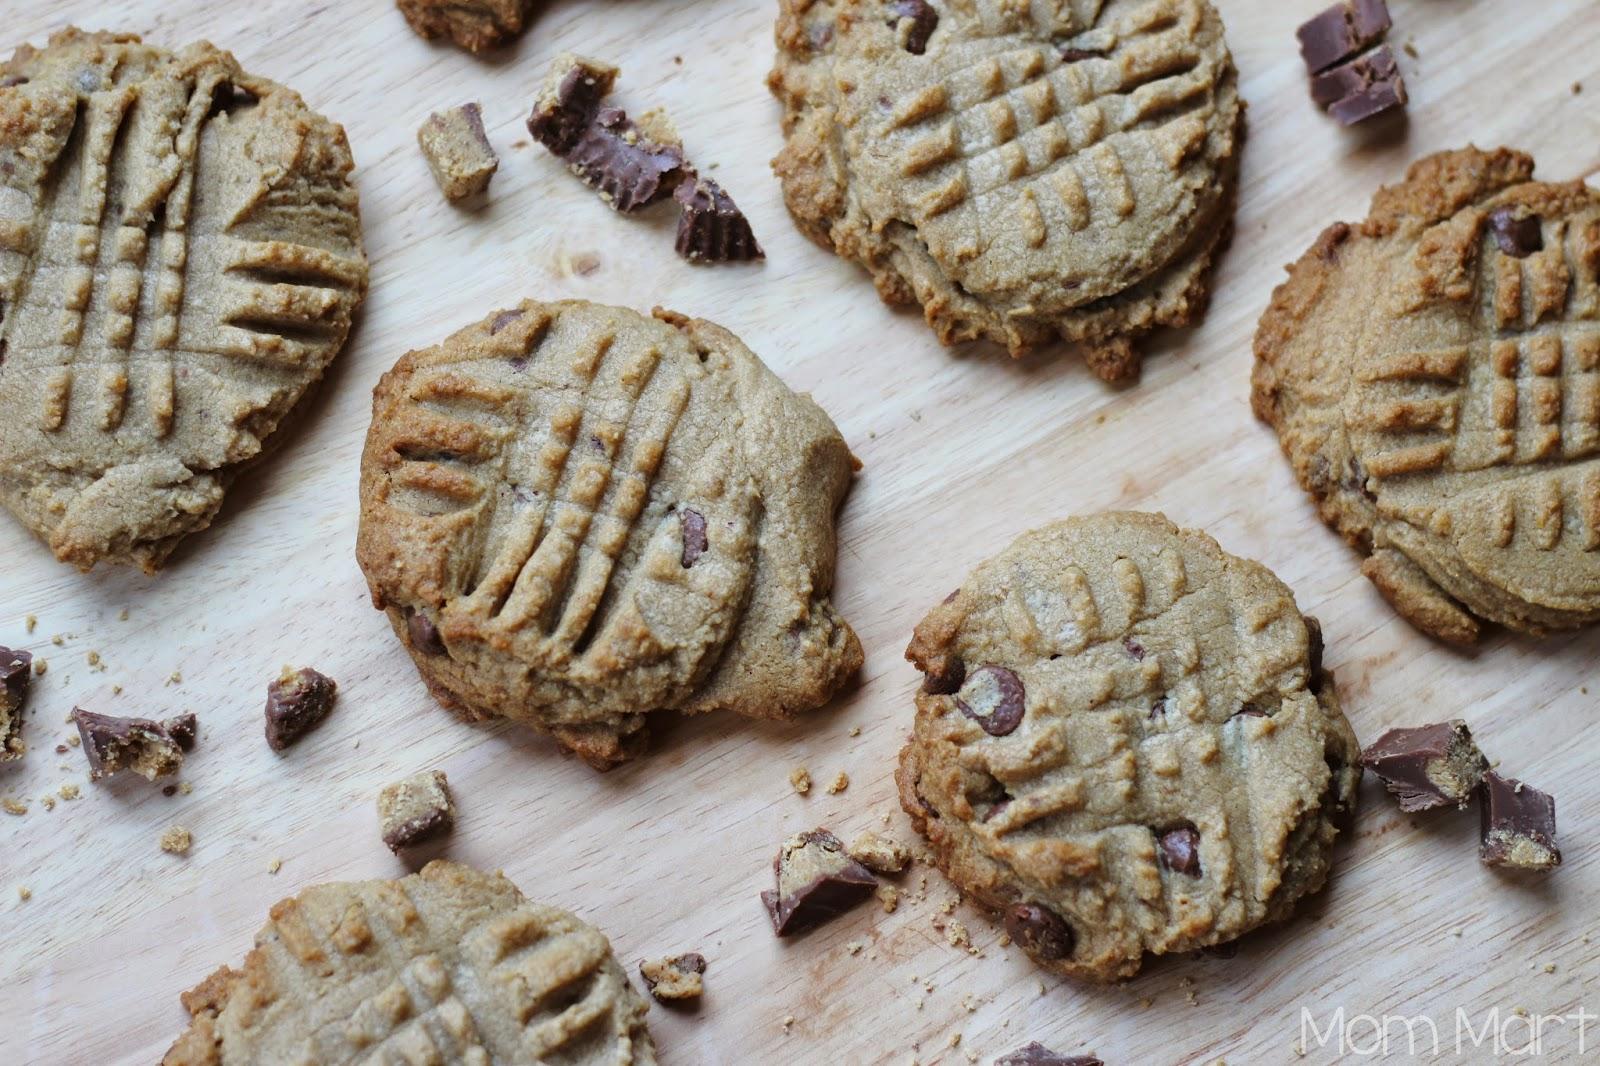 Reese's Peanut Butter Chocolate Chip Cookies #Recipe #Dessert